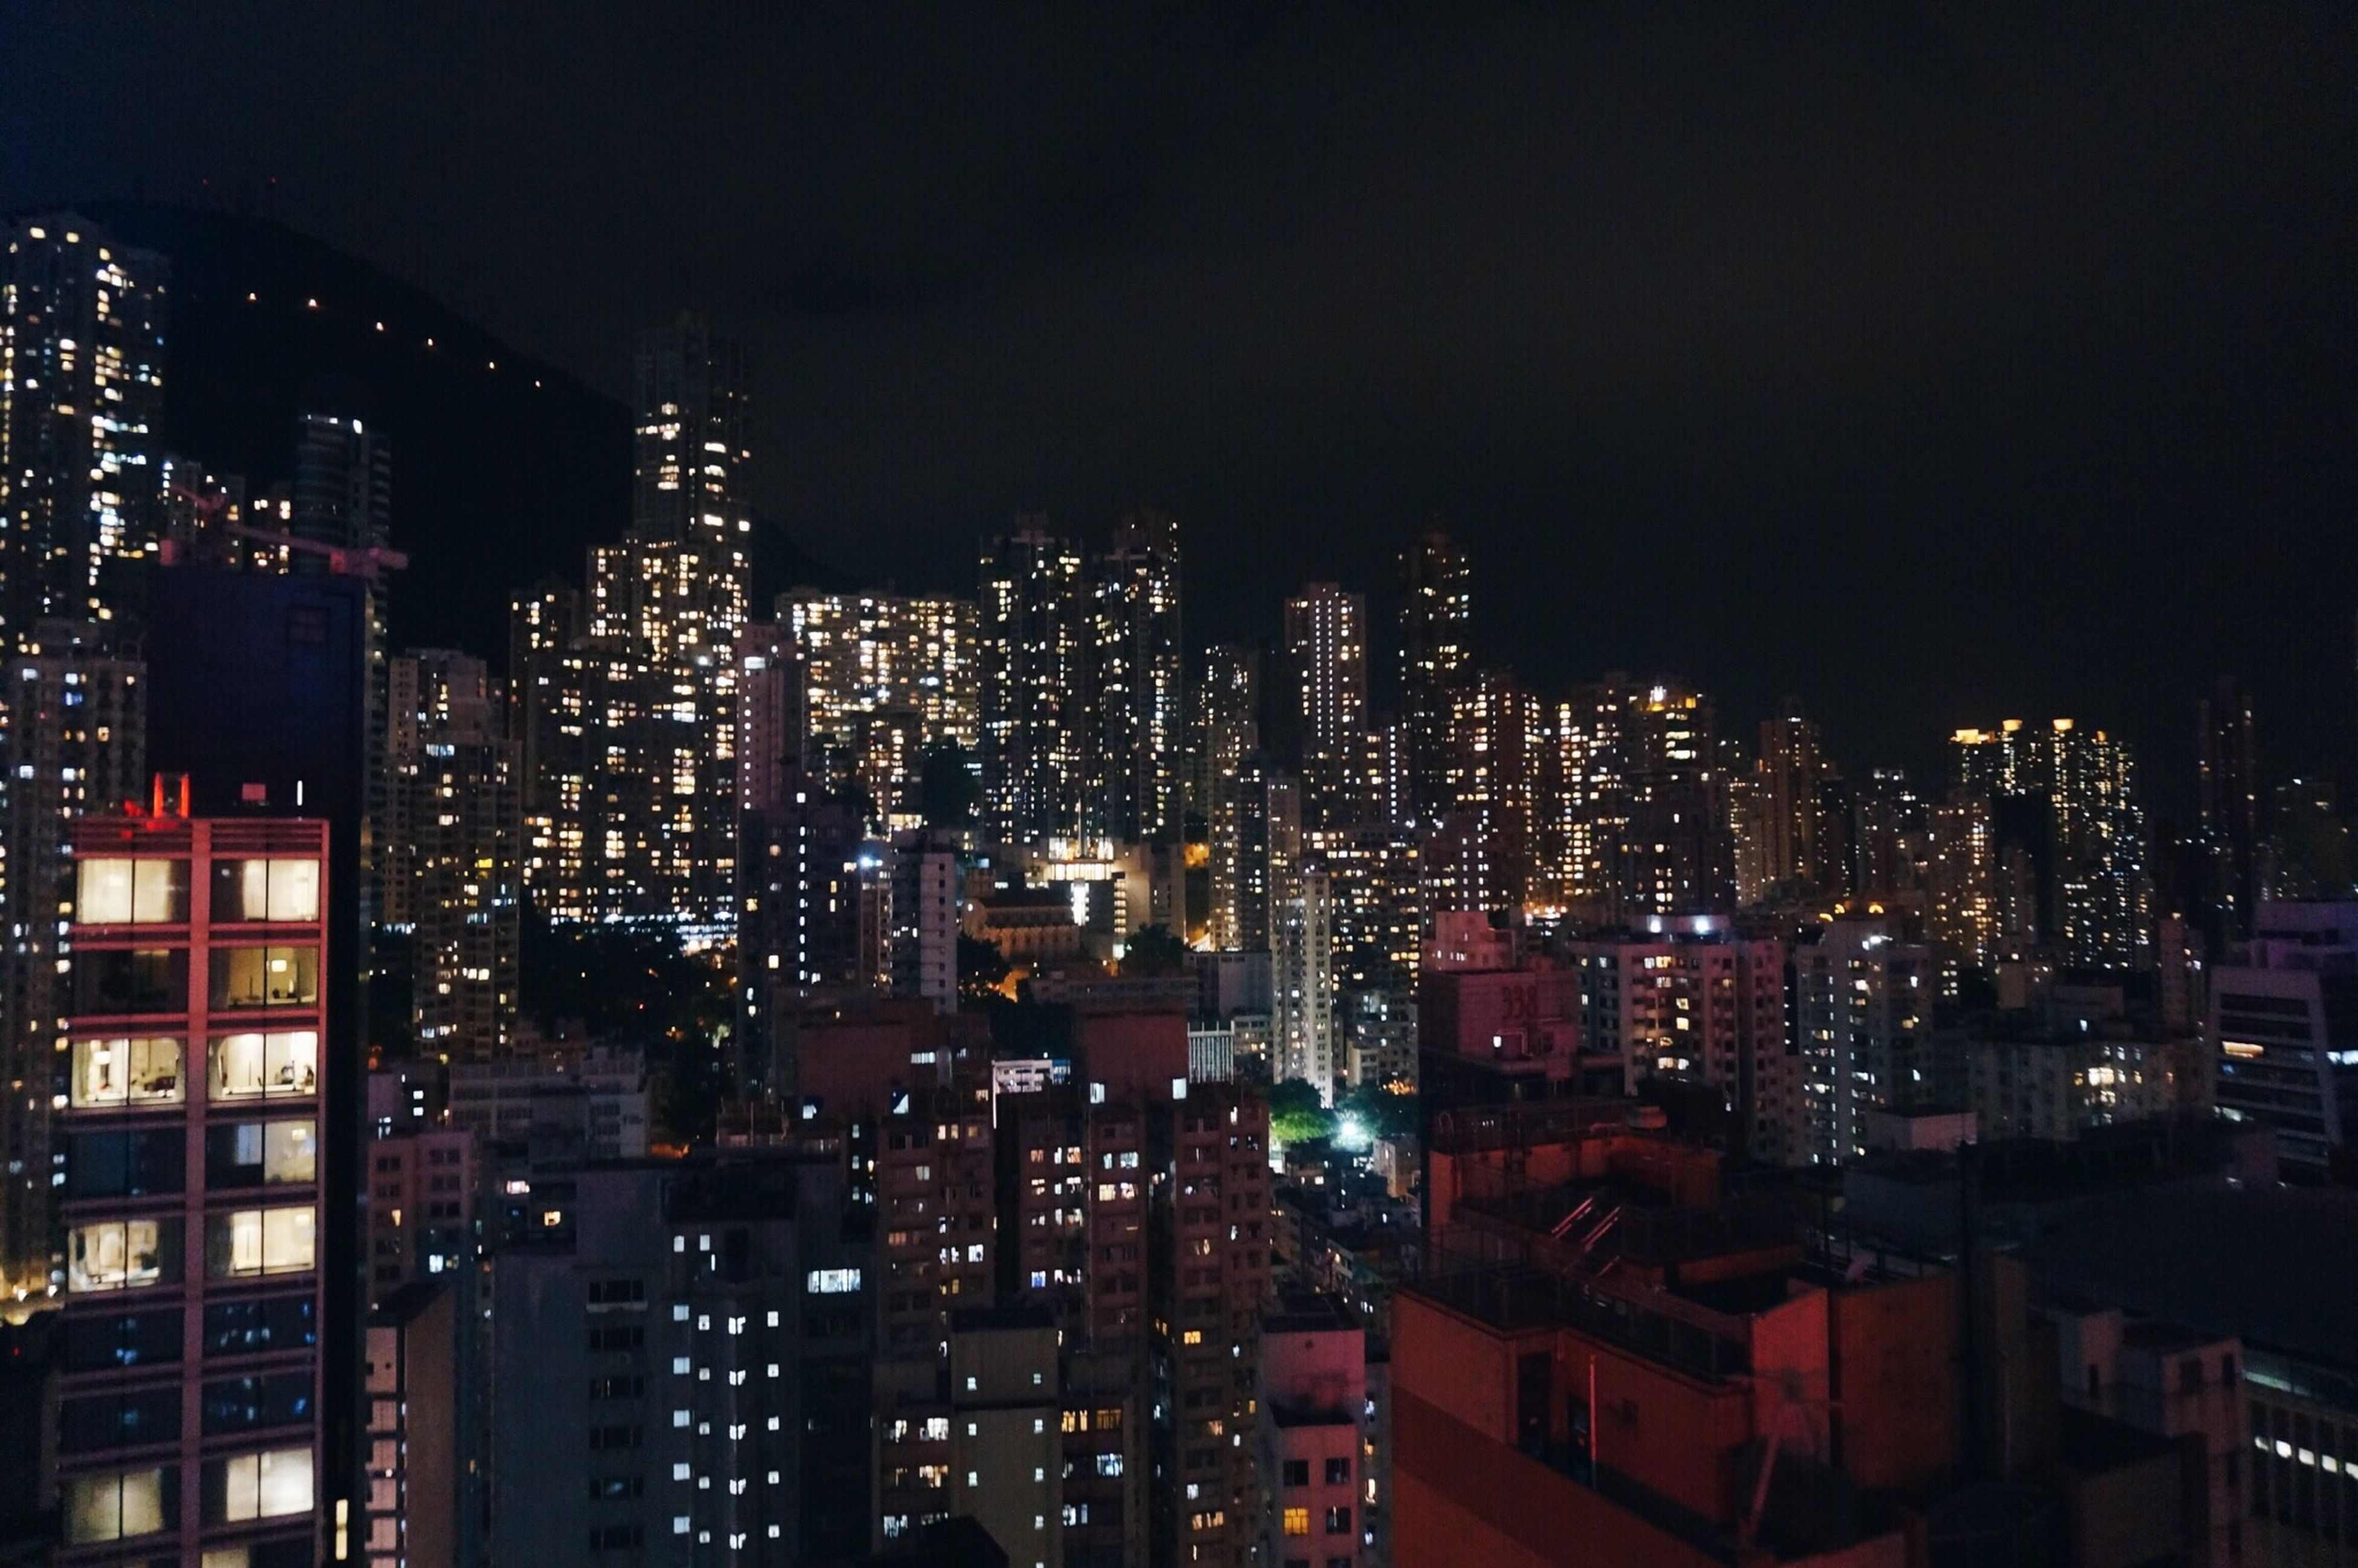 From The Rooftop HongKong 99bonham